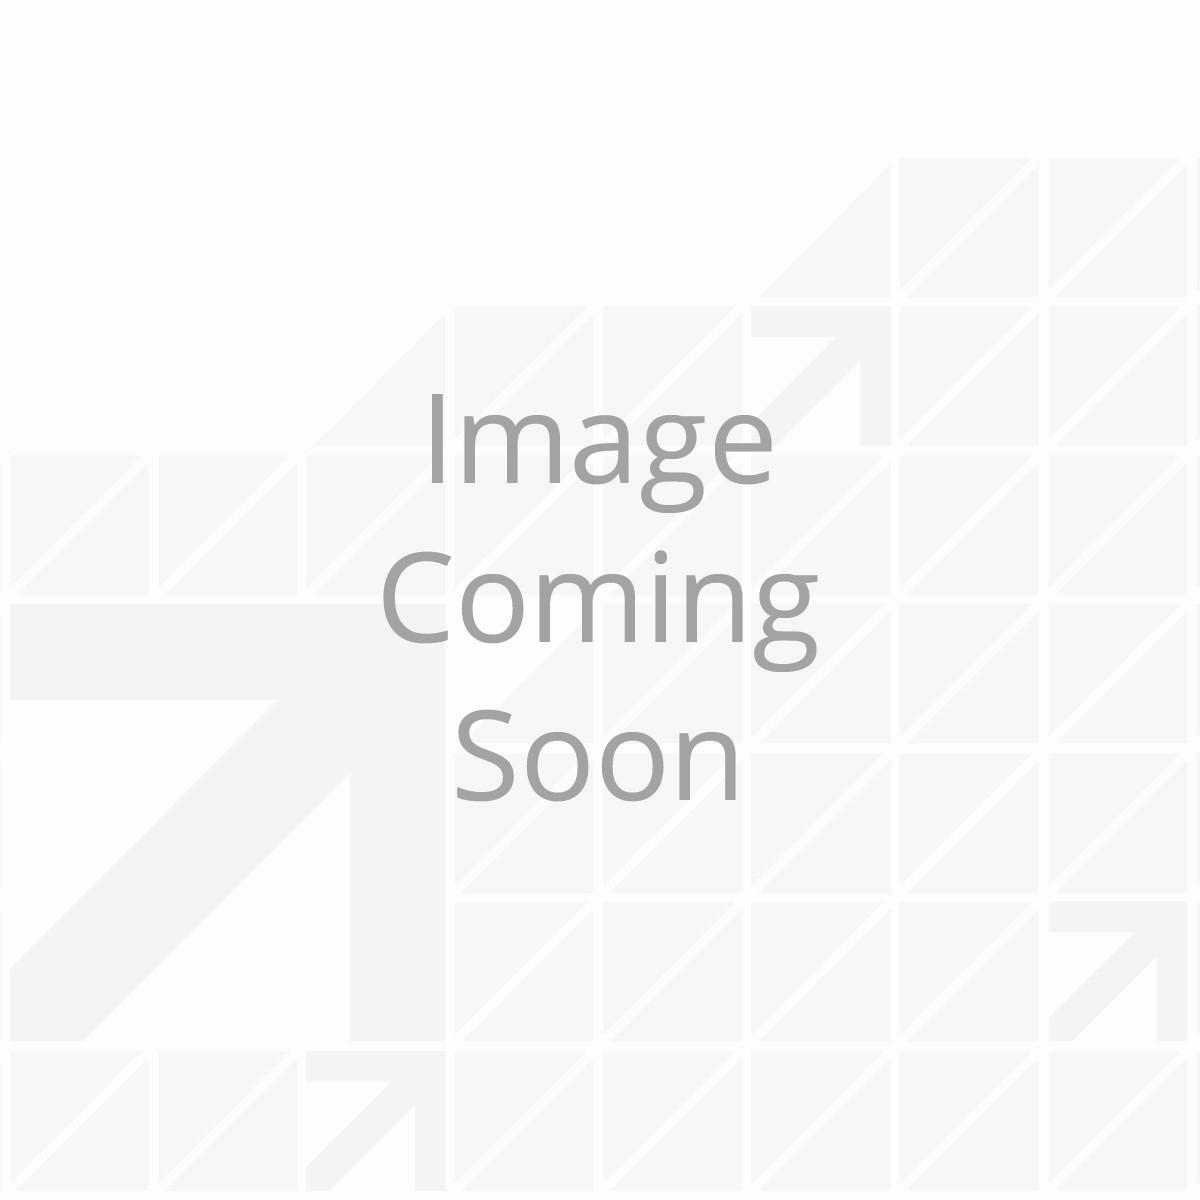 Thomas Payne® Premium Mattress